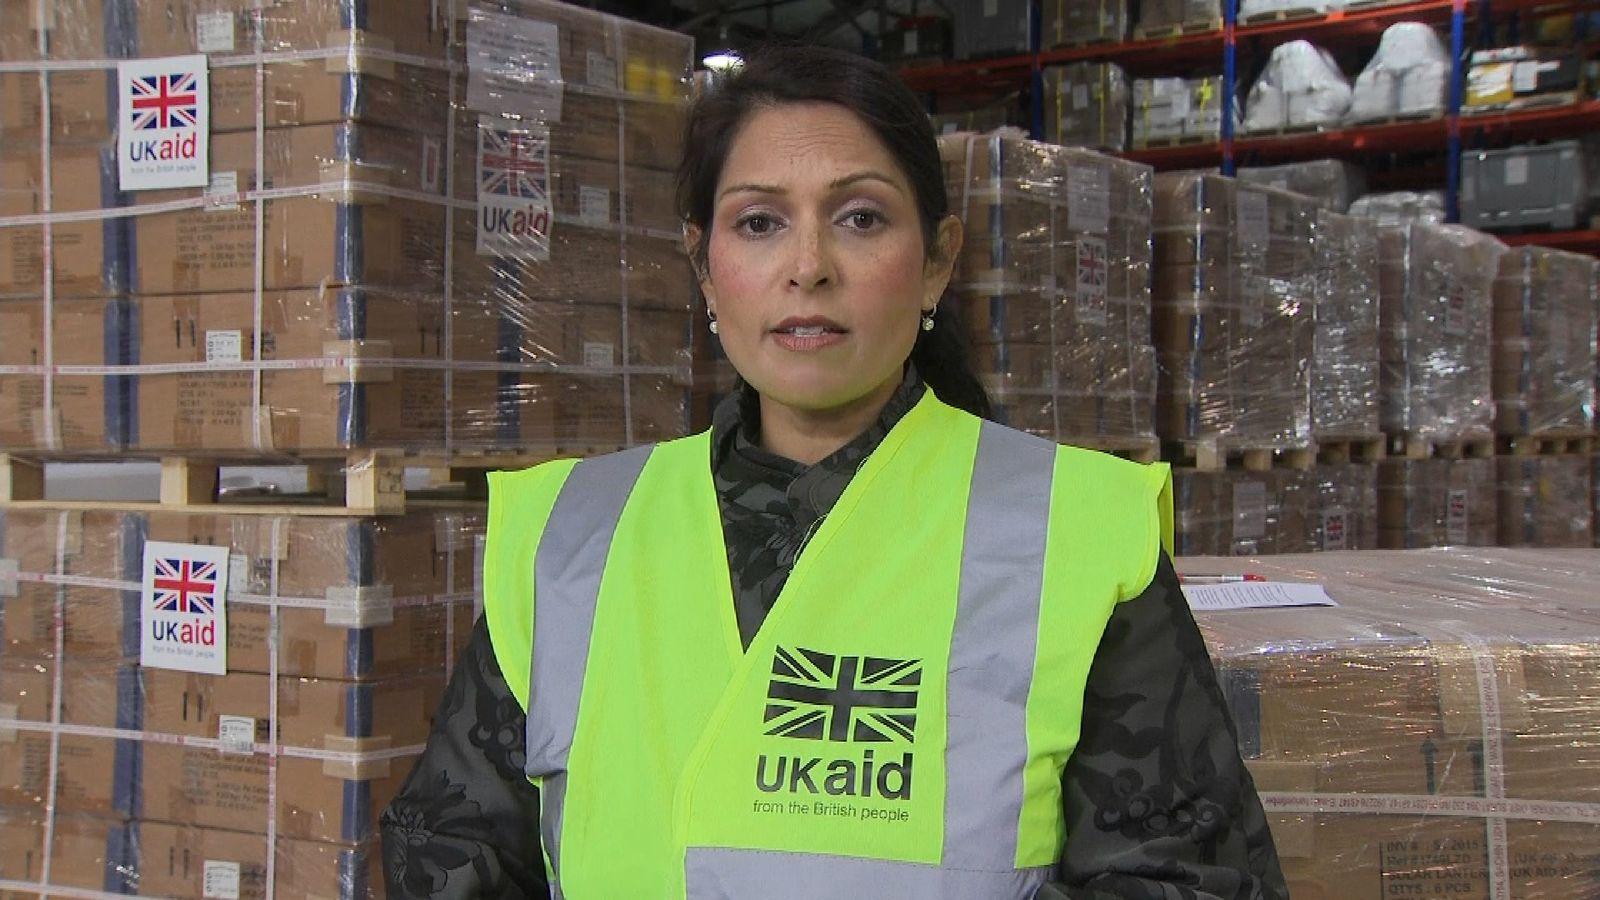 International Development Secretary Priti Patel dicsusses the UK's response to Hurricane Irma